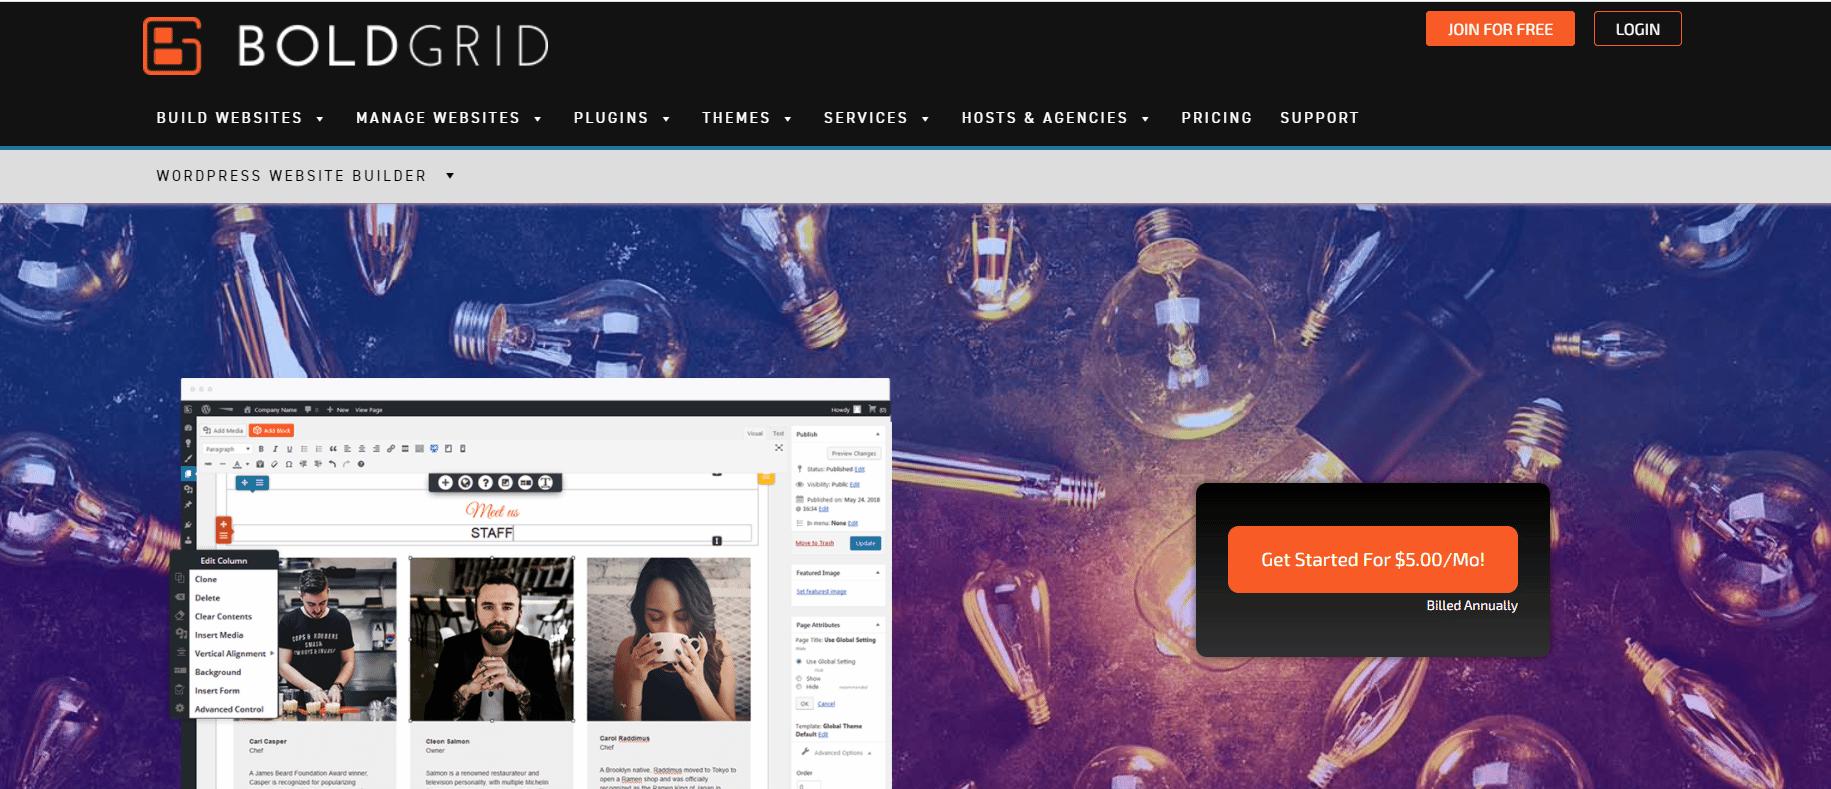 Boldgrid网站构建器。